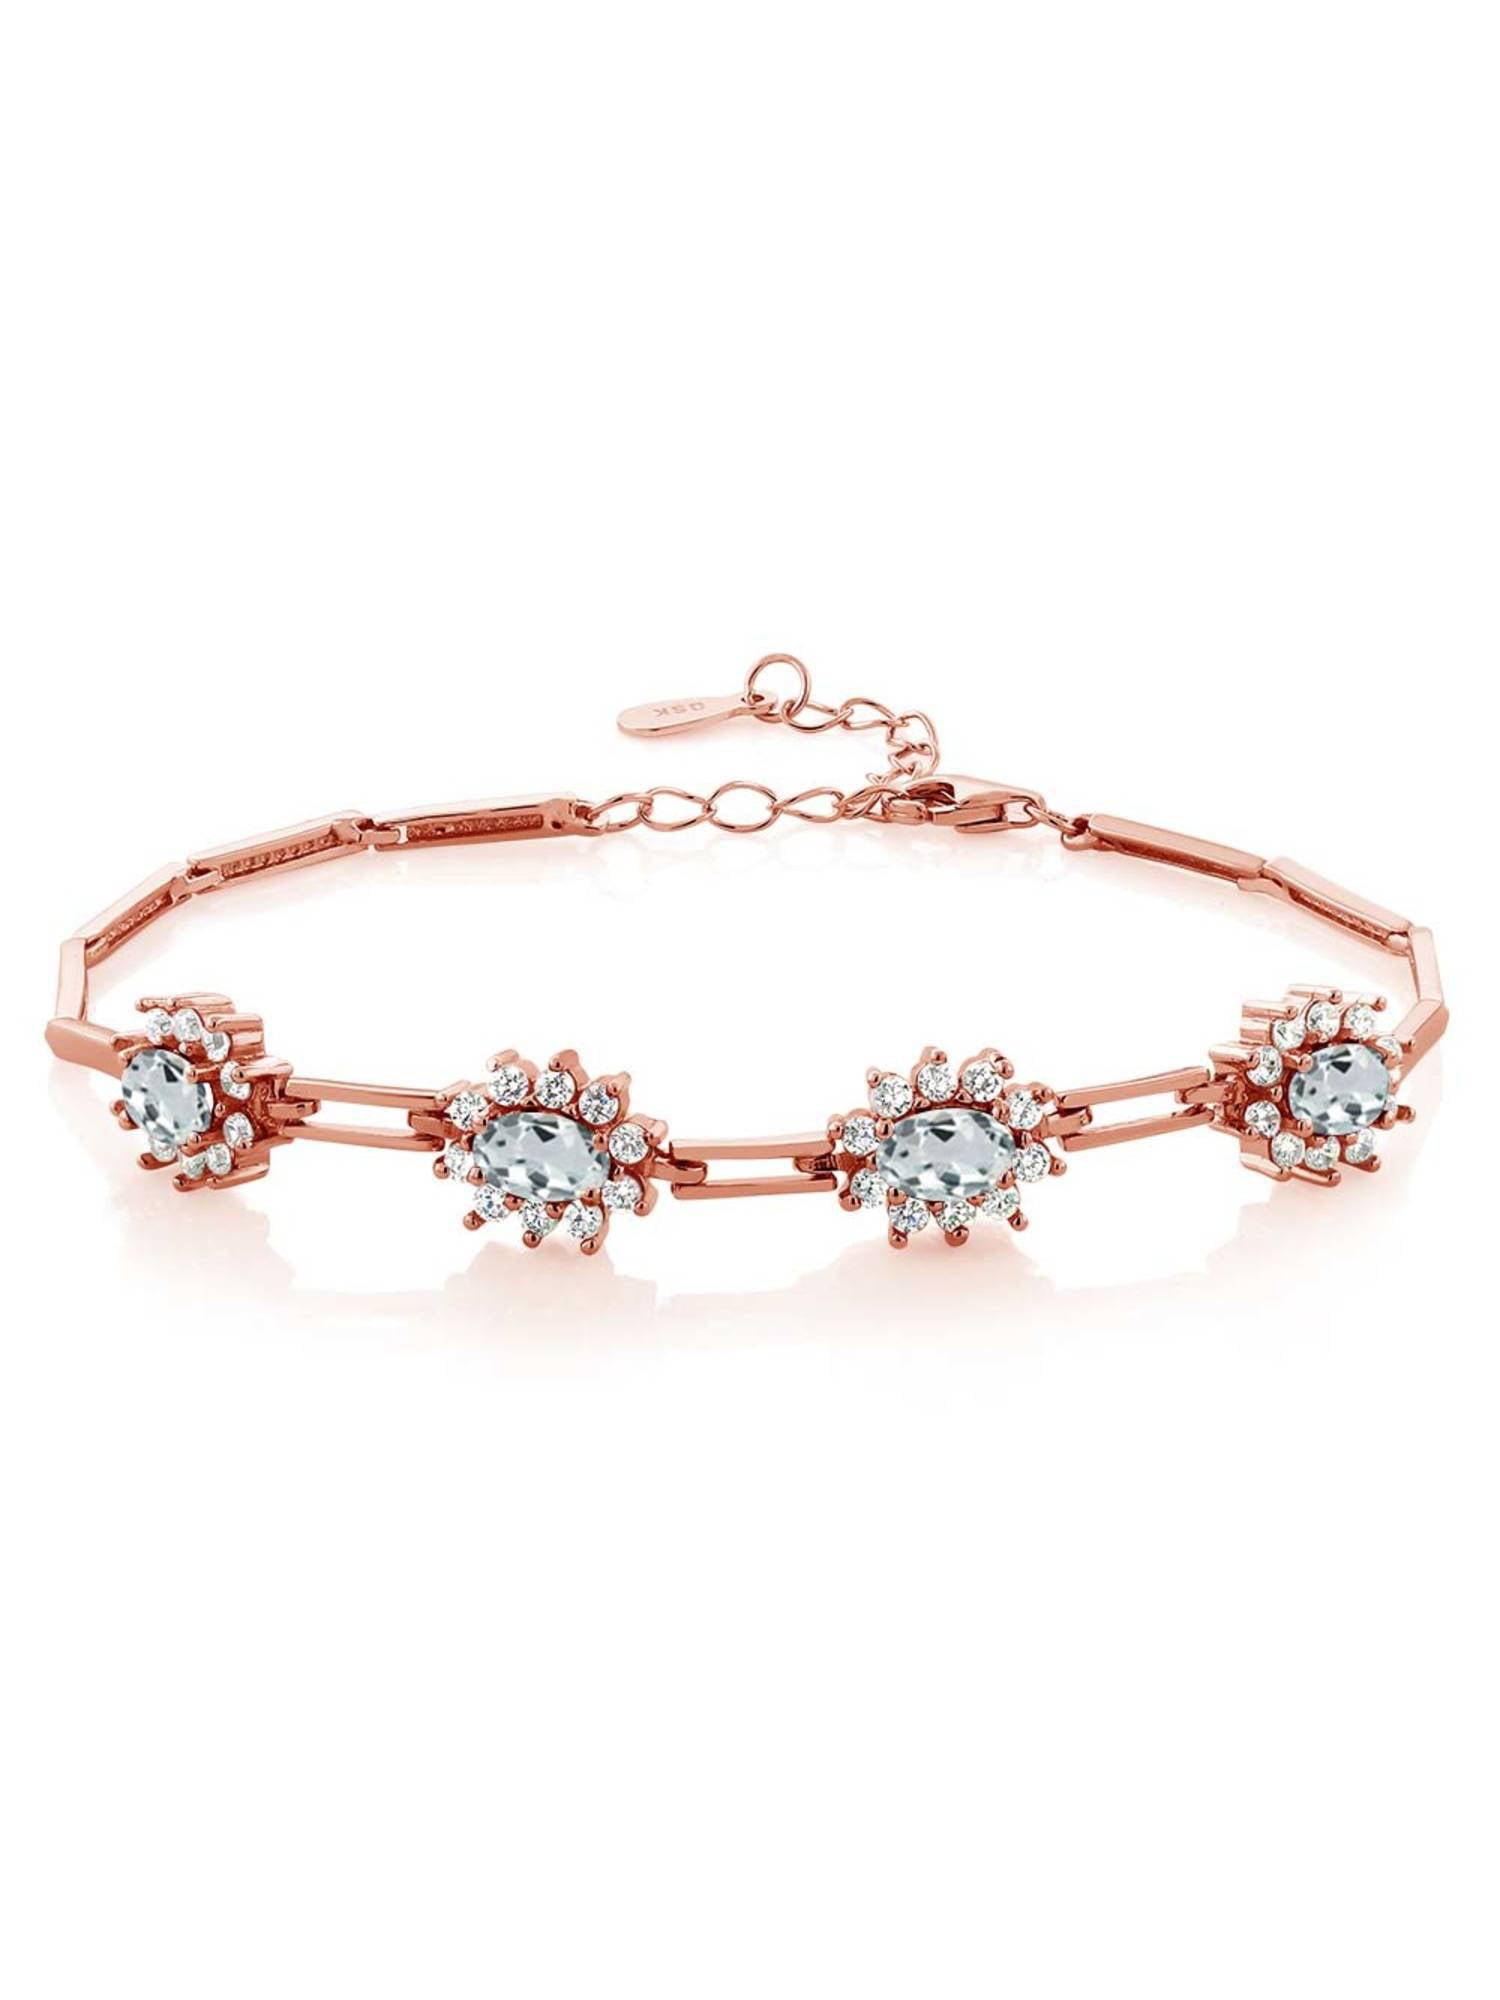 3.72 Ct Oval Sky Blue Aquamarine 18K Rose Gold Plated Silver Bracelet by